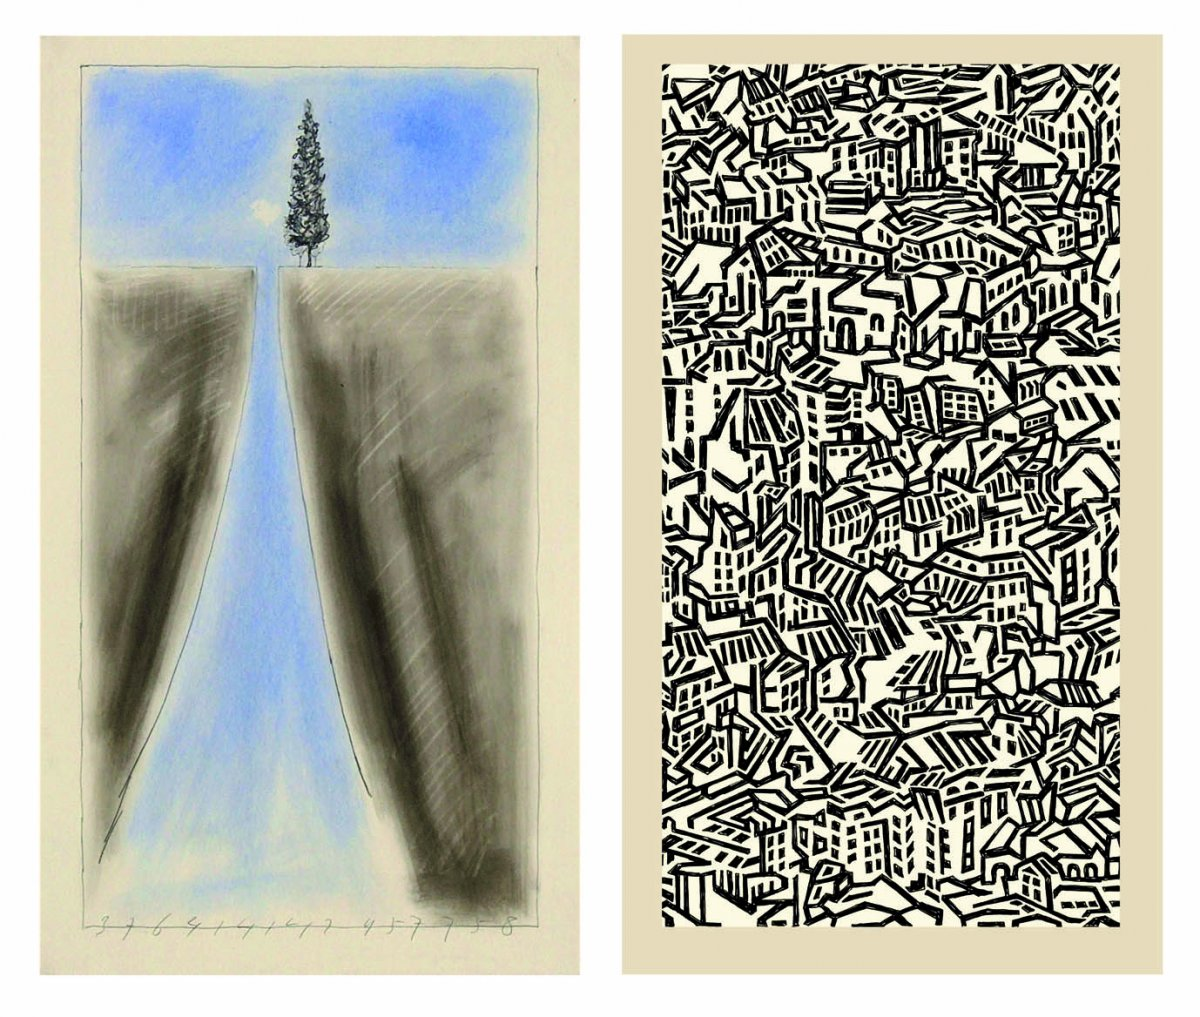 Links: sarabande, de weg tot vereniging (Jaap Mulder) en rechts a geometry echoes (Yvon Né).